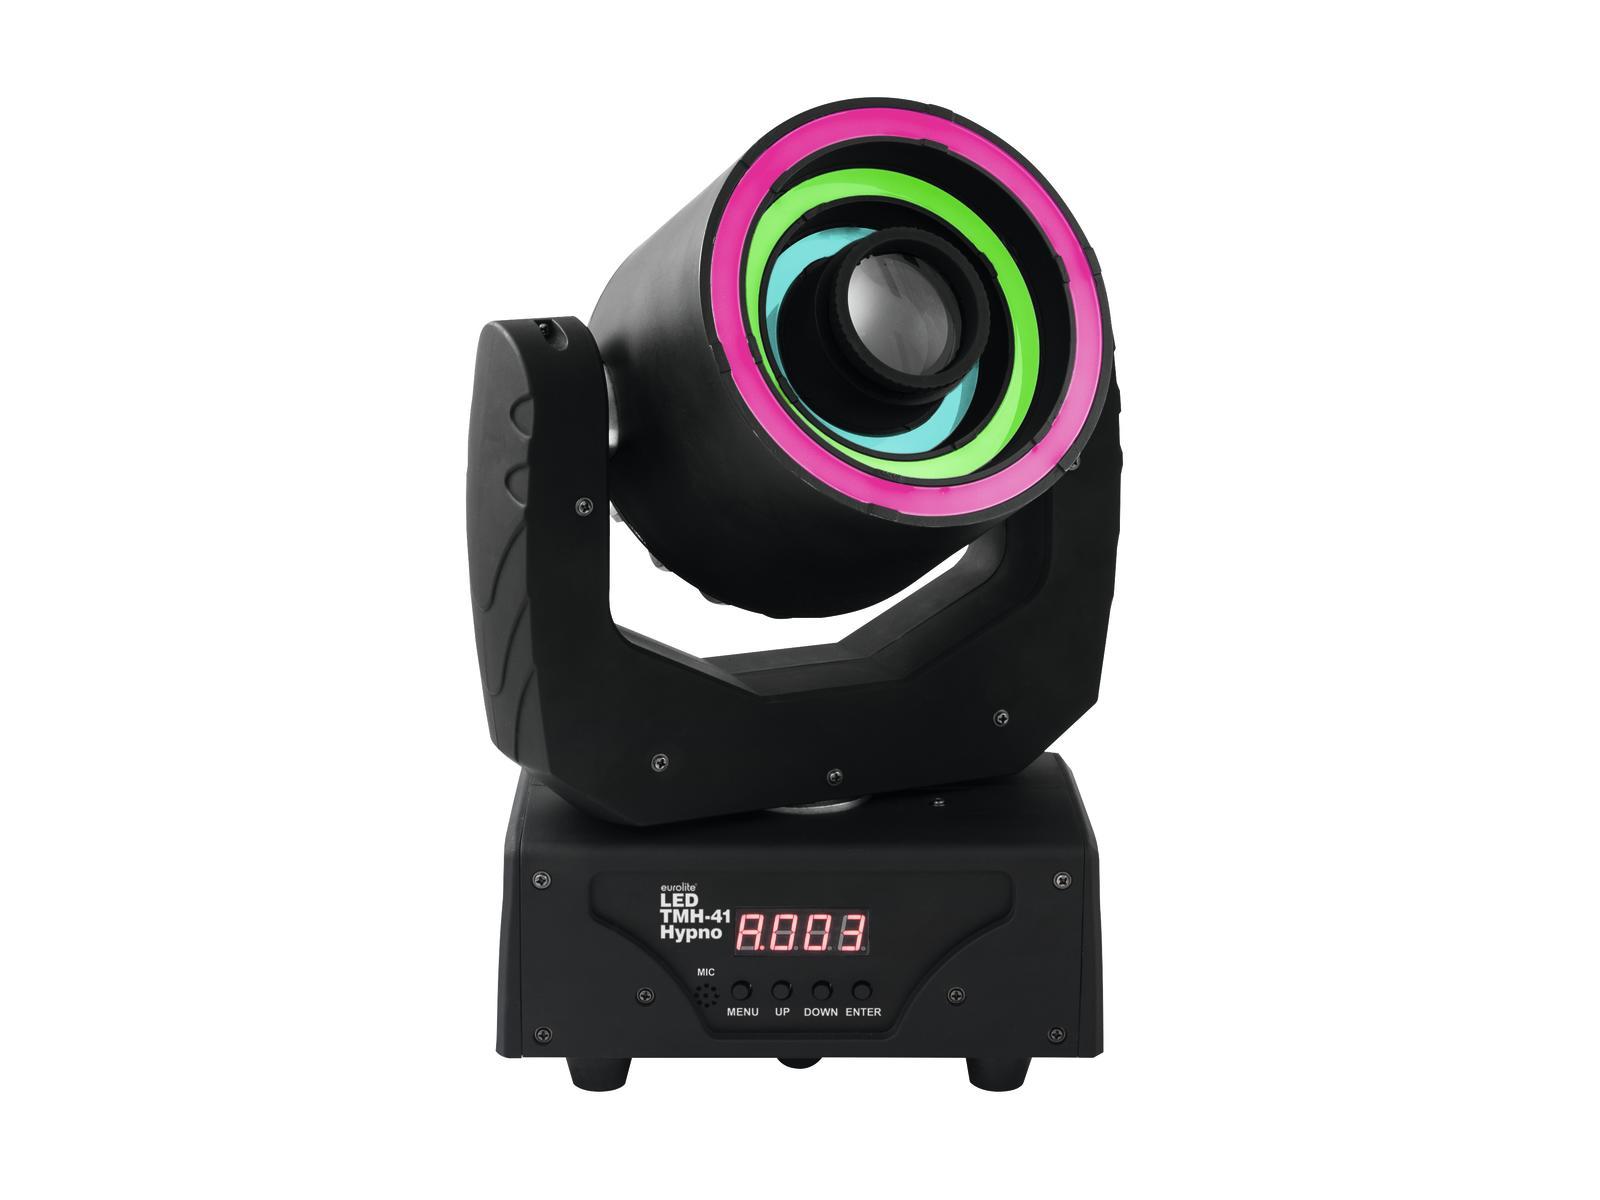 eurolite-led-tmh-41-hypno-moving-head-spot